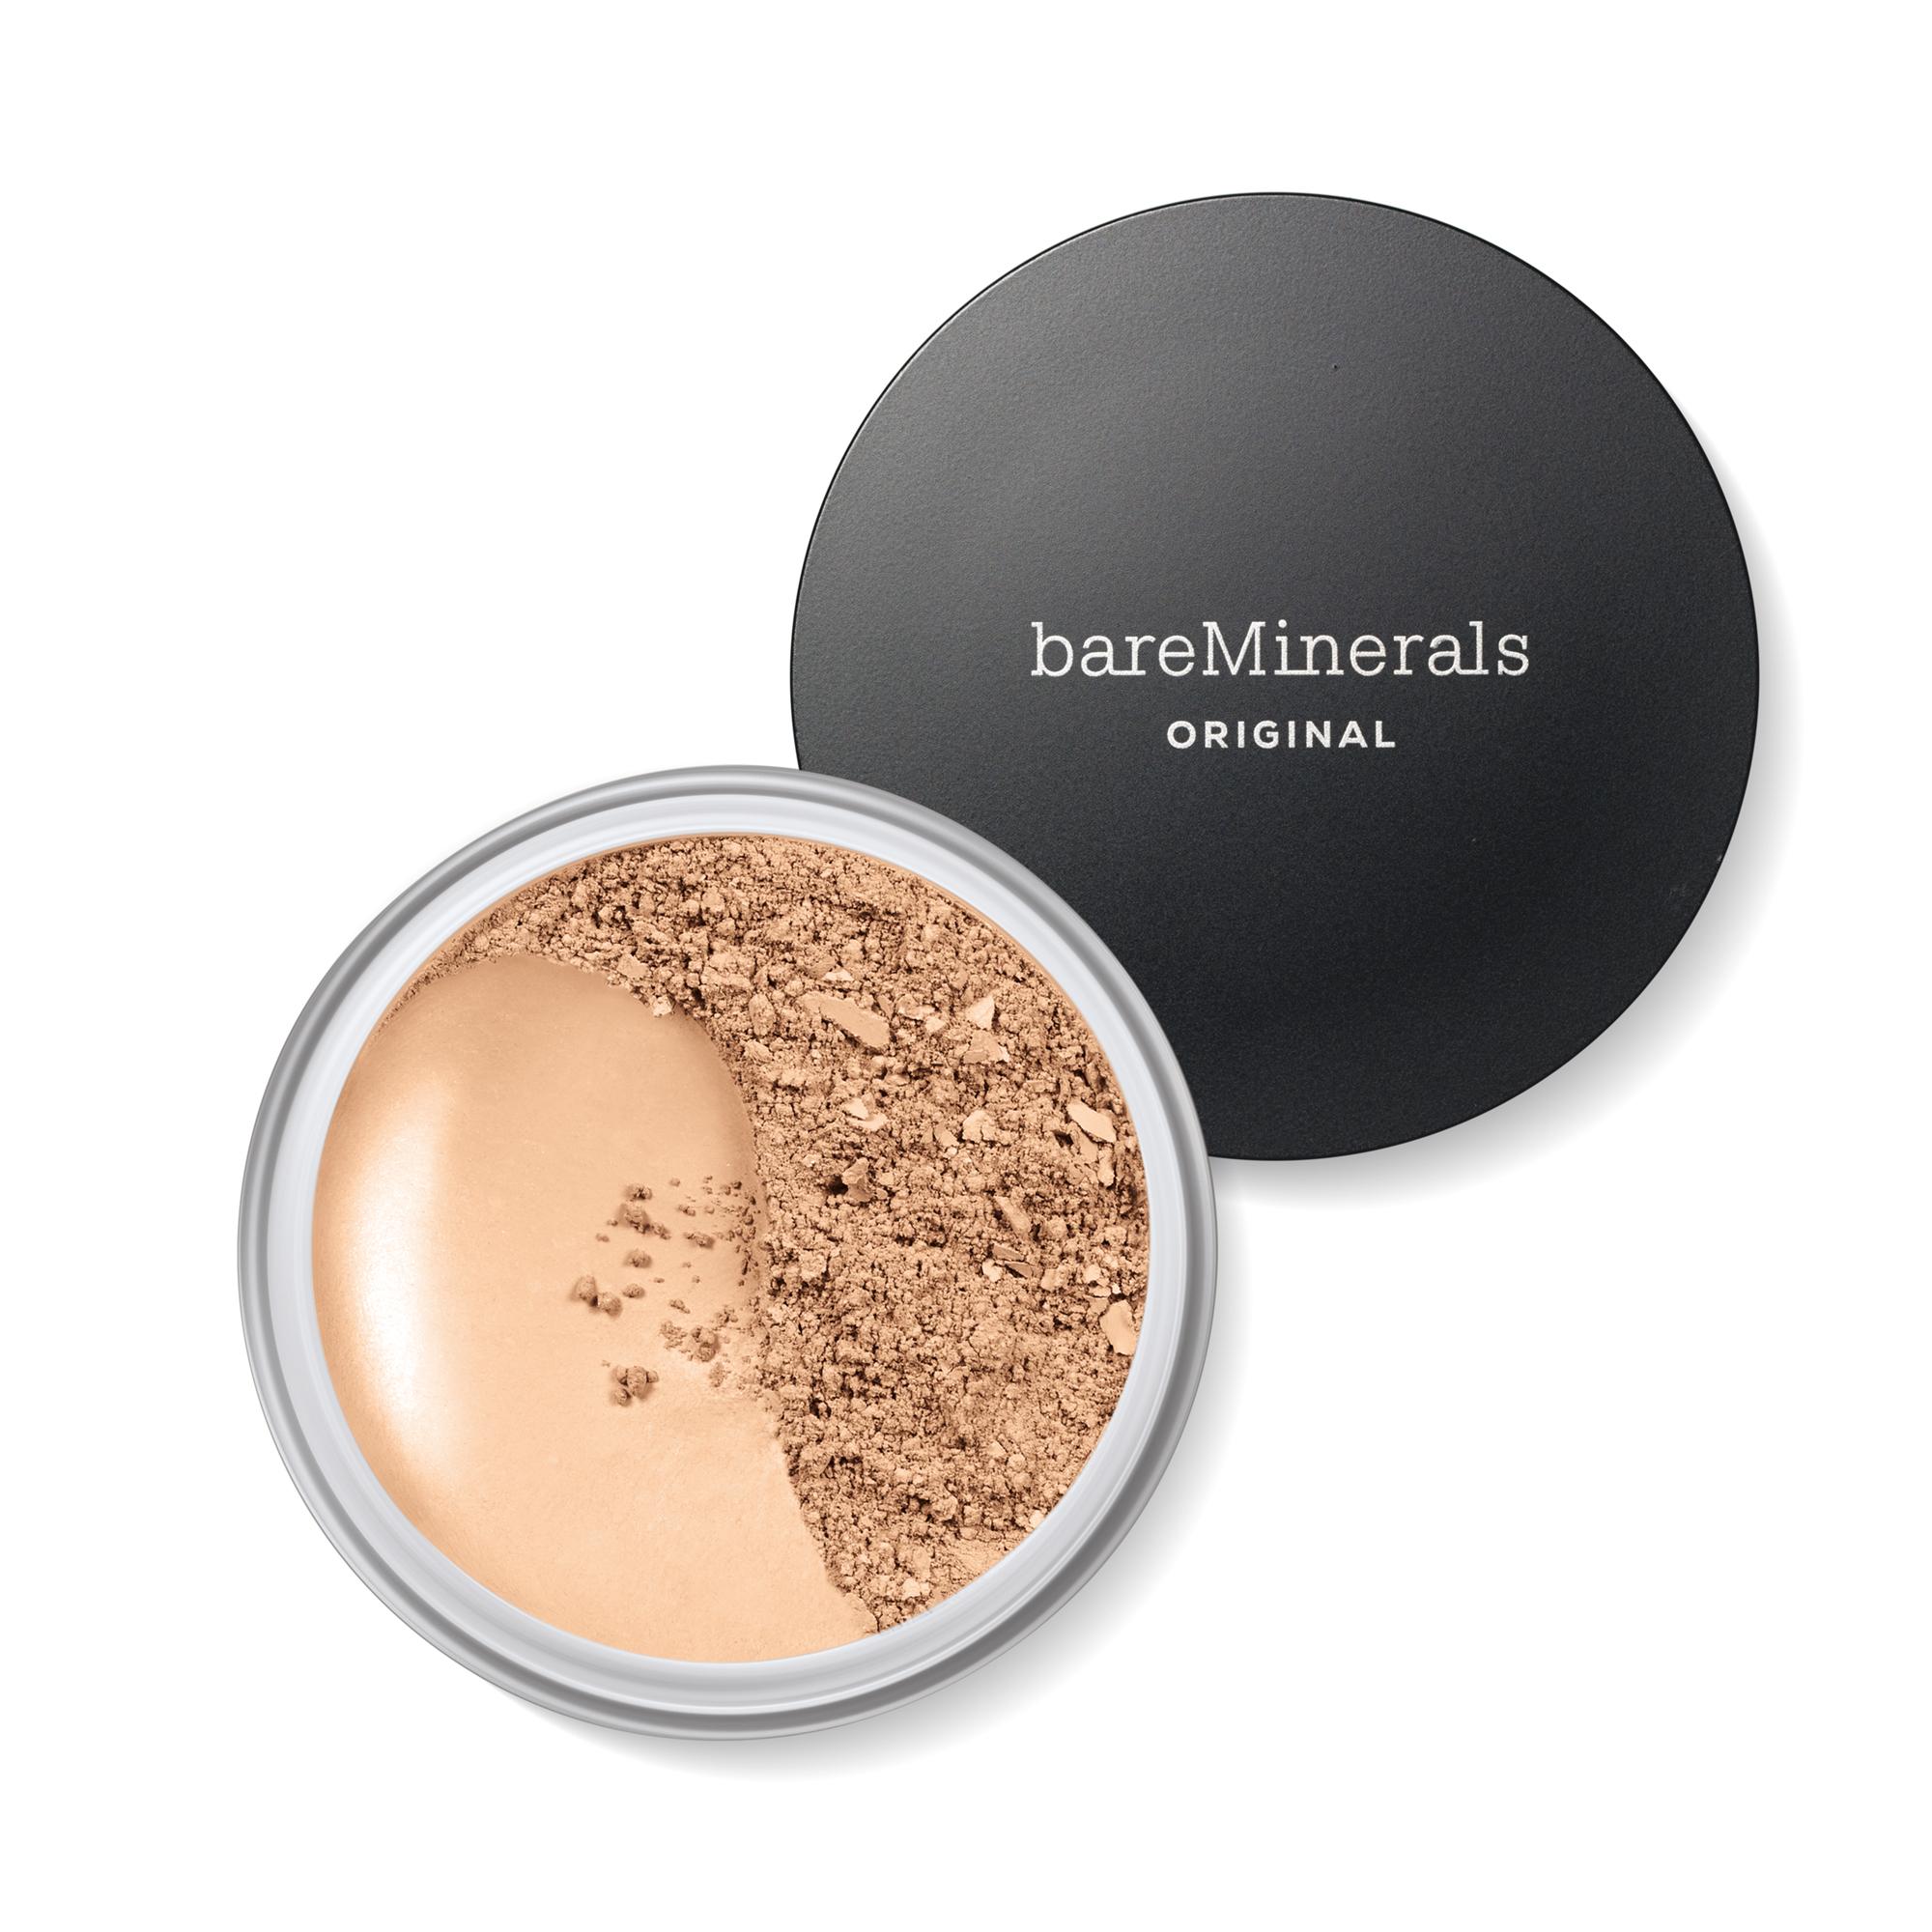 bareMinerals Original Foundation, 12 medium beige